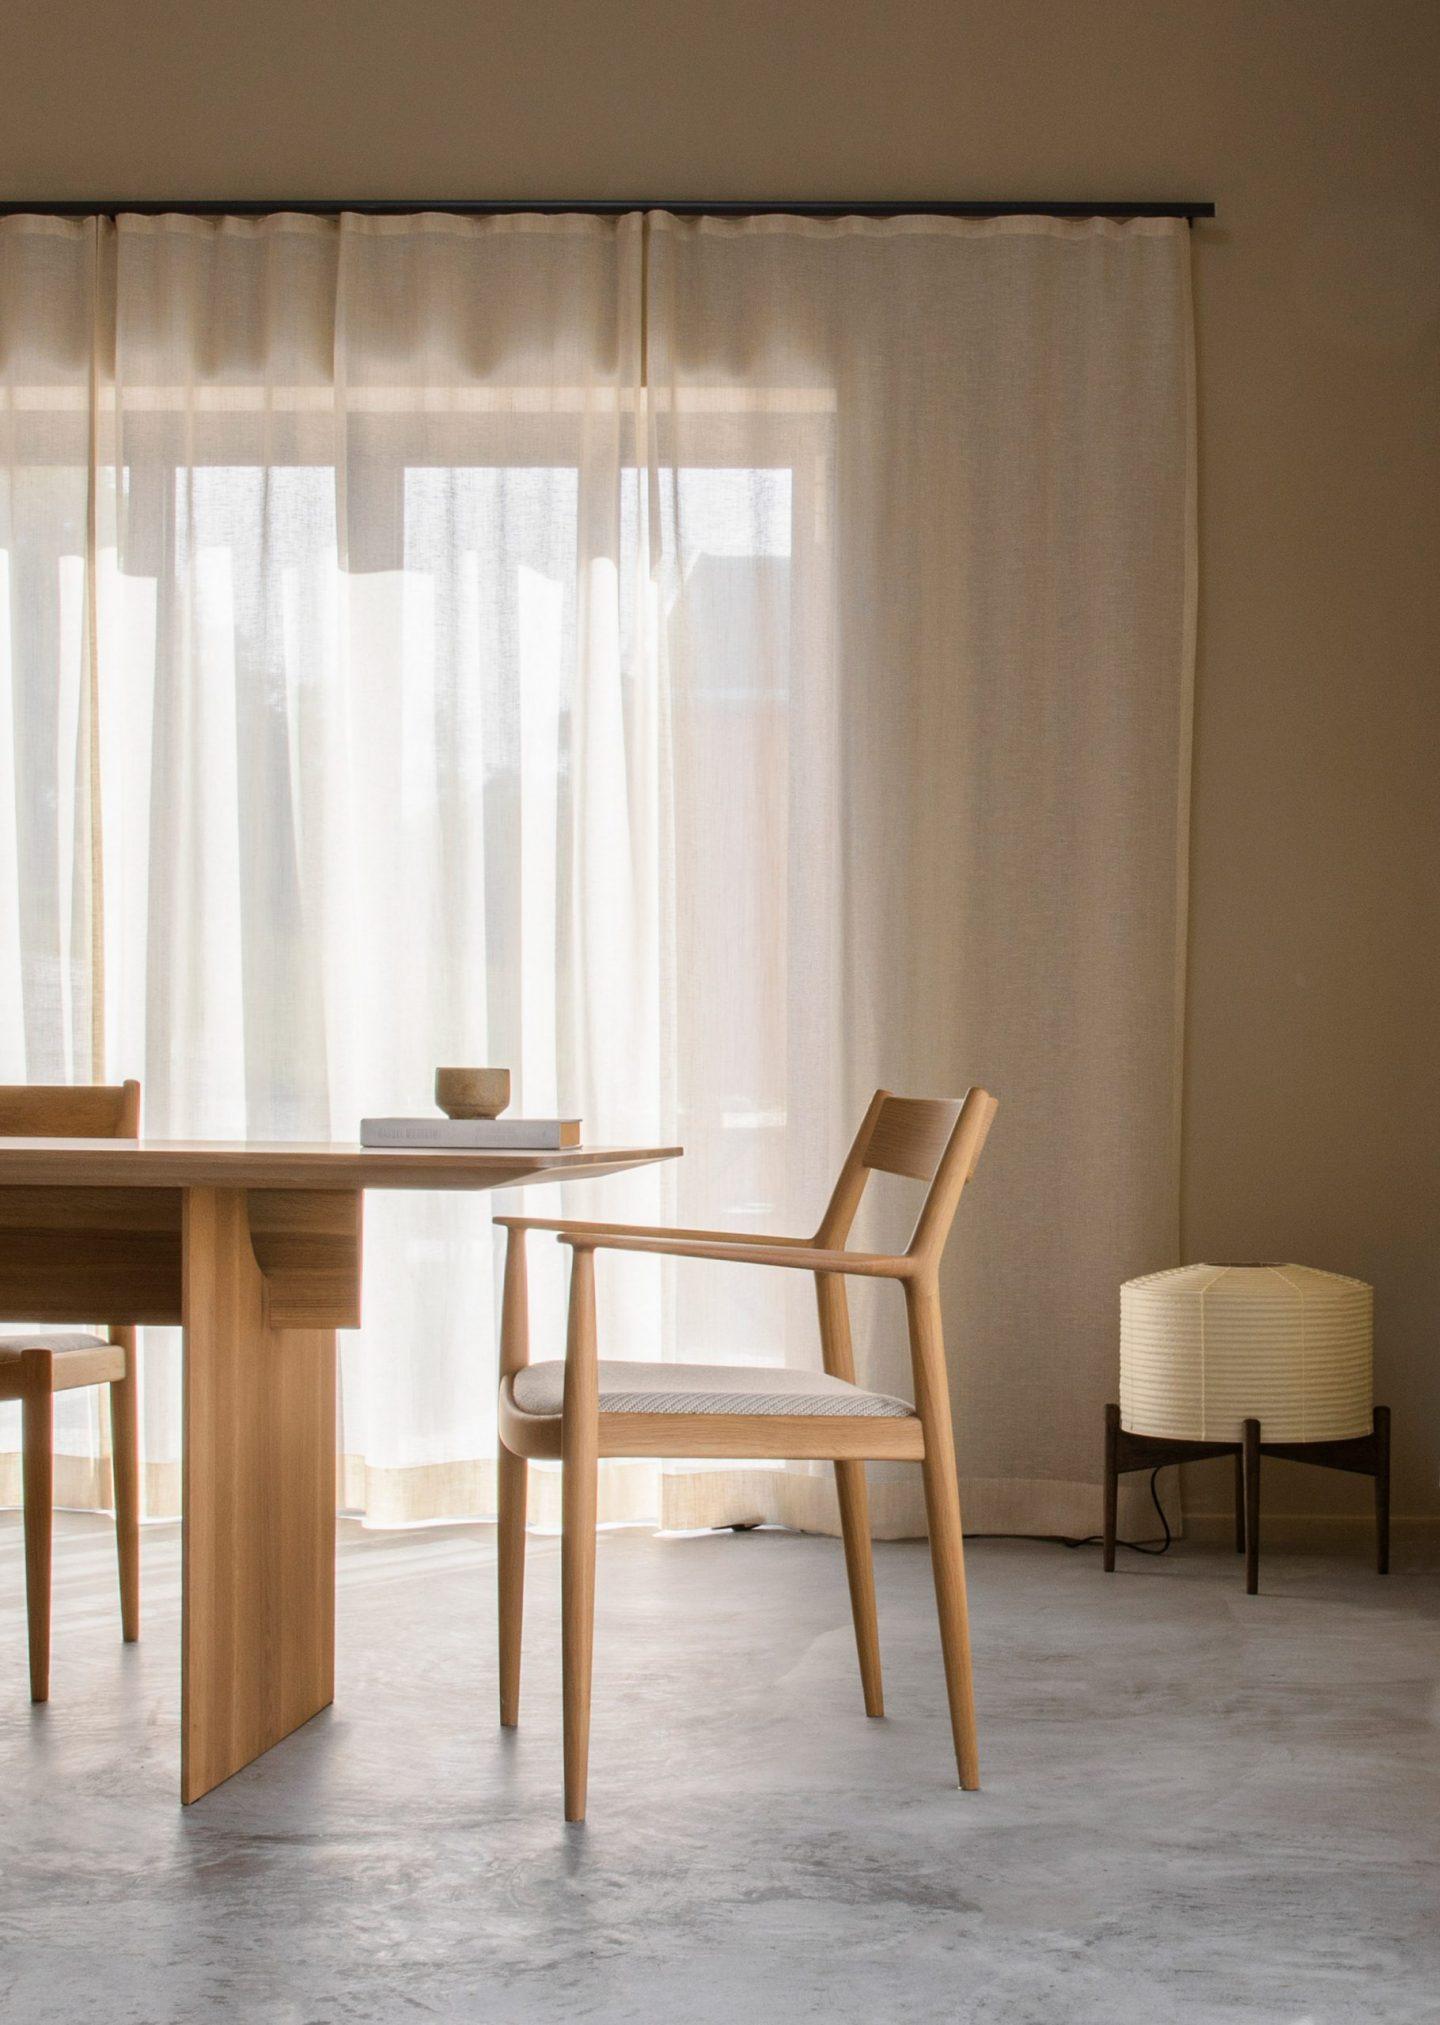 IGNANT-Architecture-Norm-Architects-Archipelago-House-017